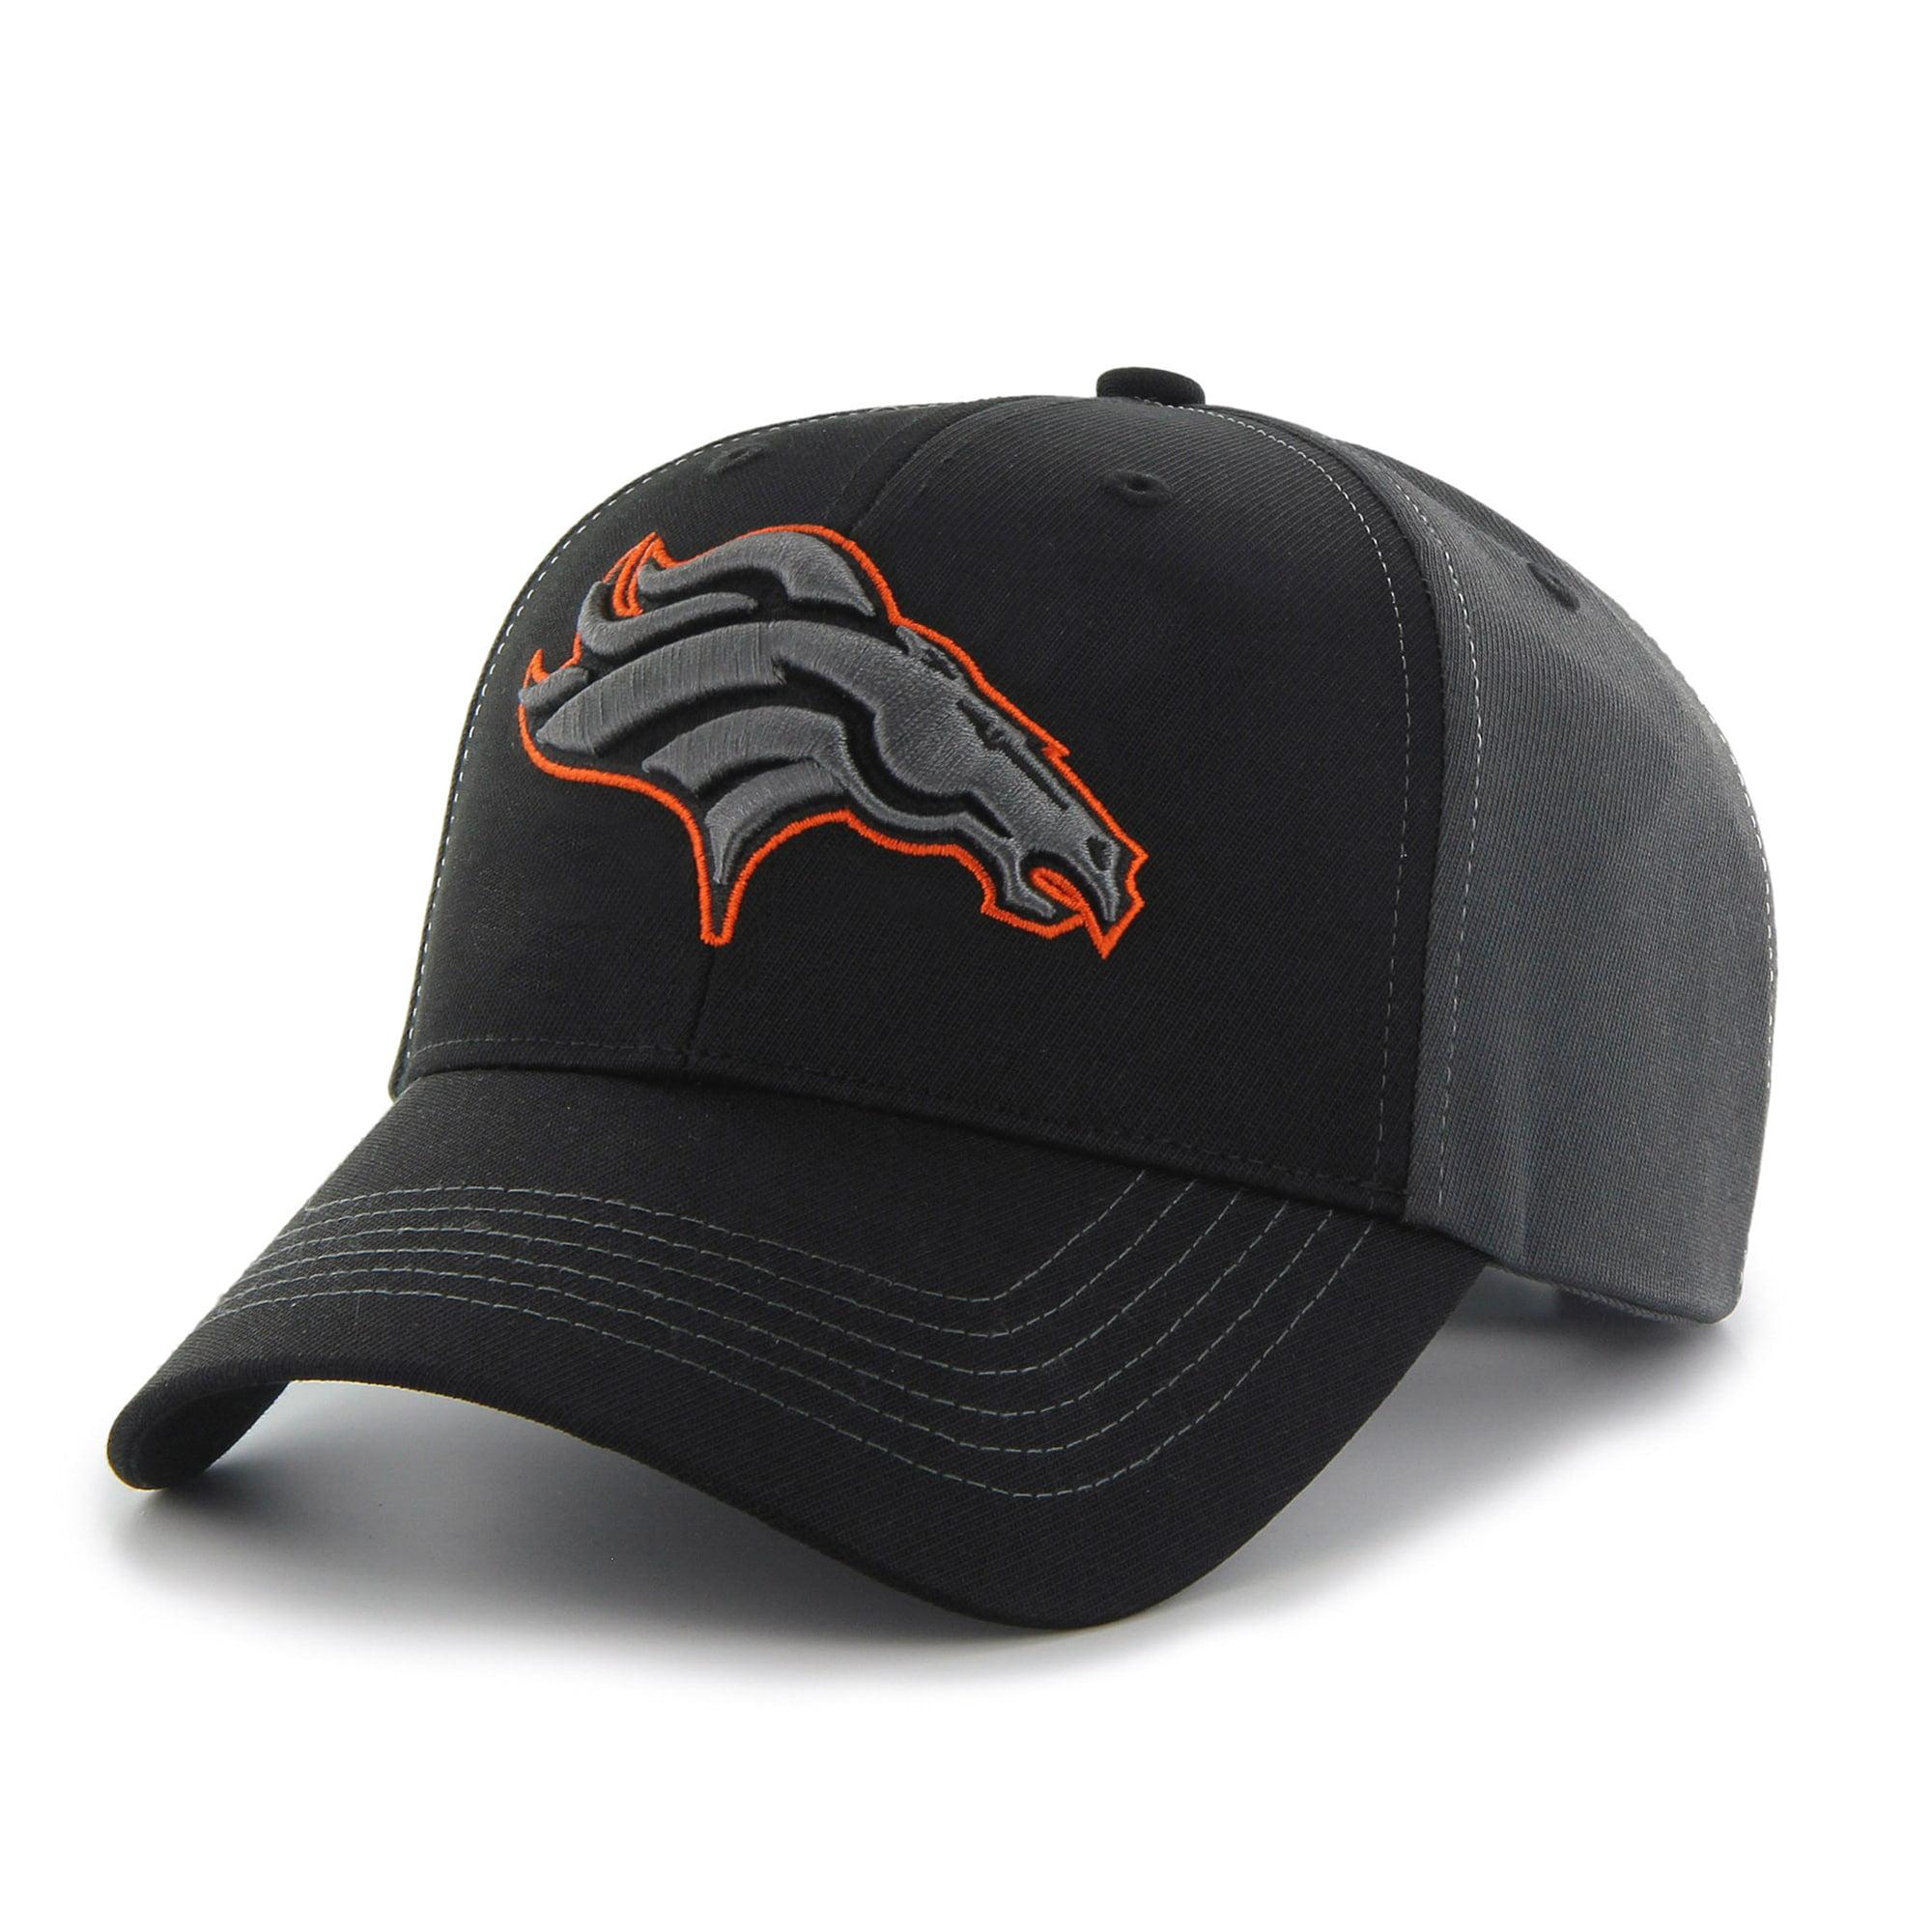 NFL Denver Broncos Blackball Cap / Hat by Fan Favorite